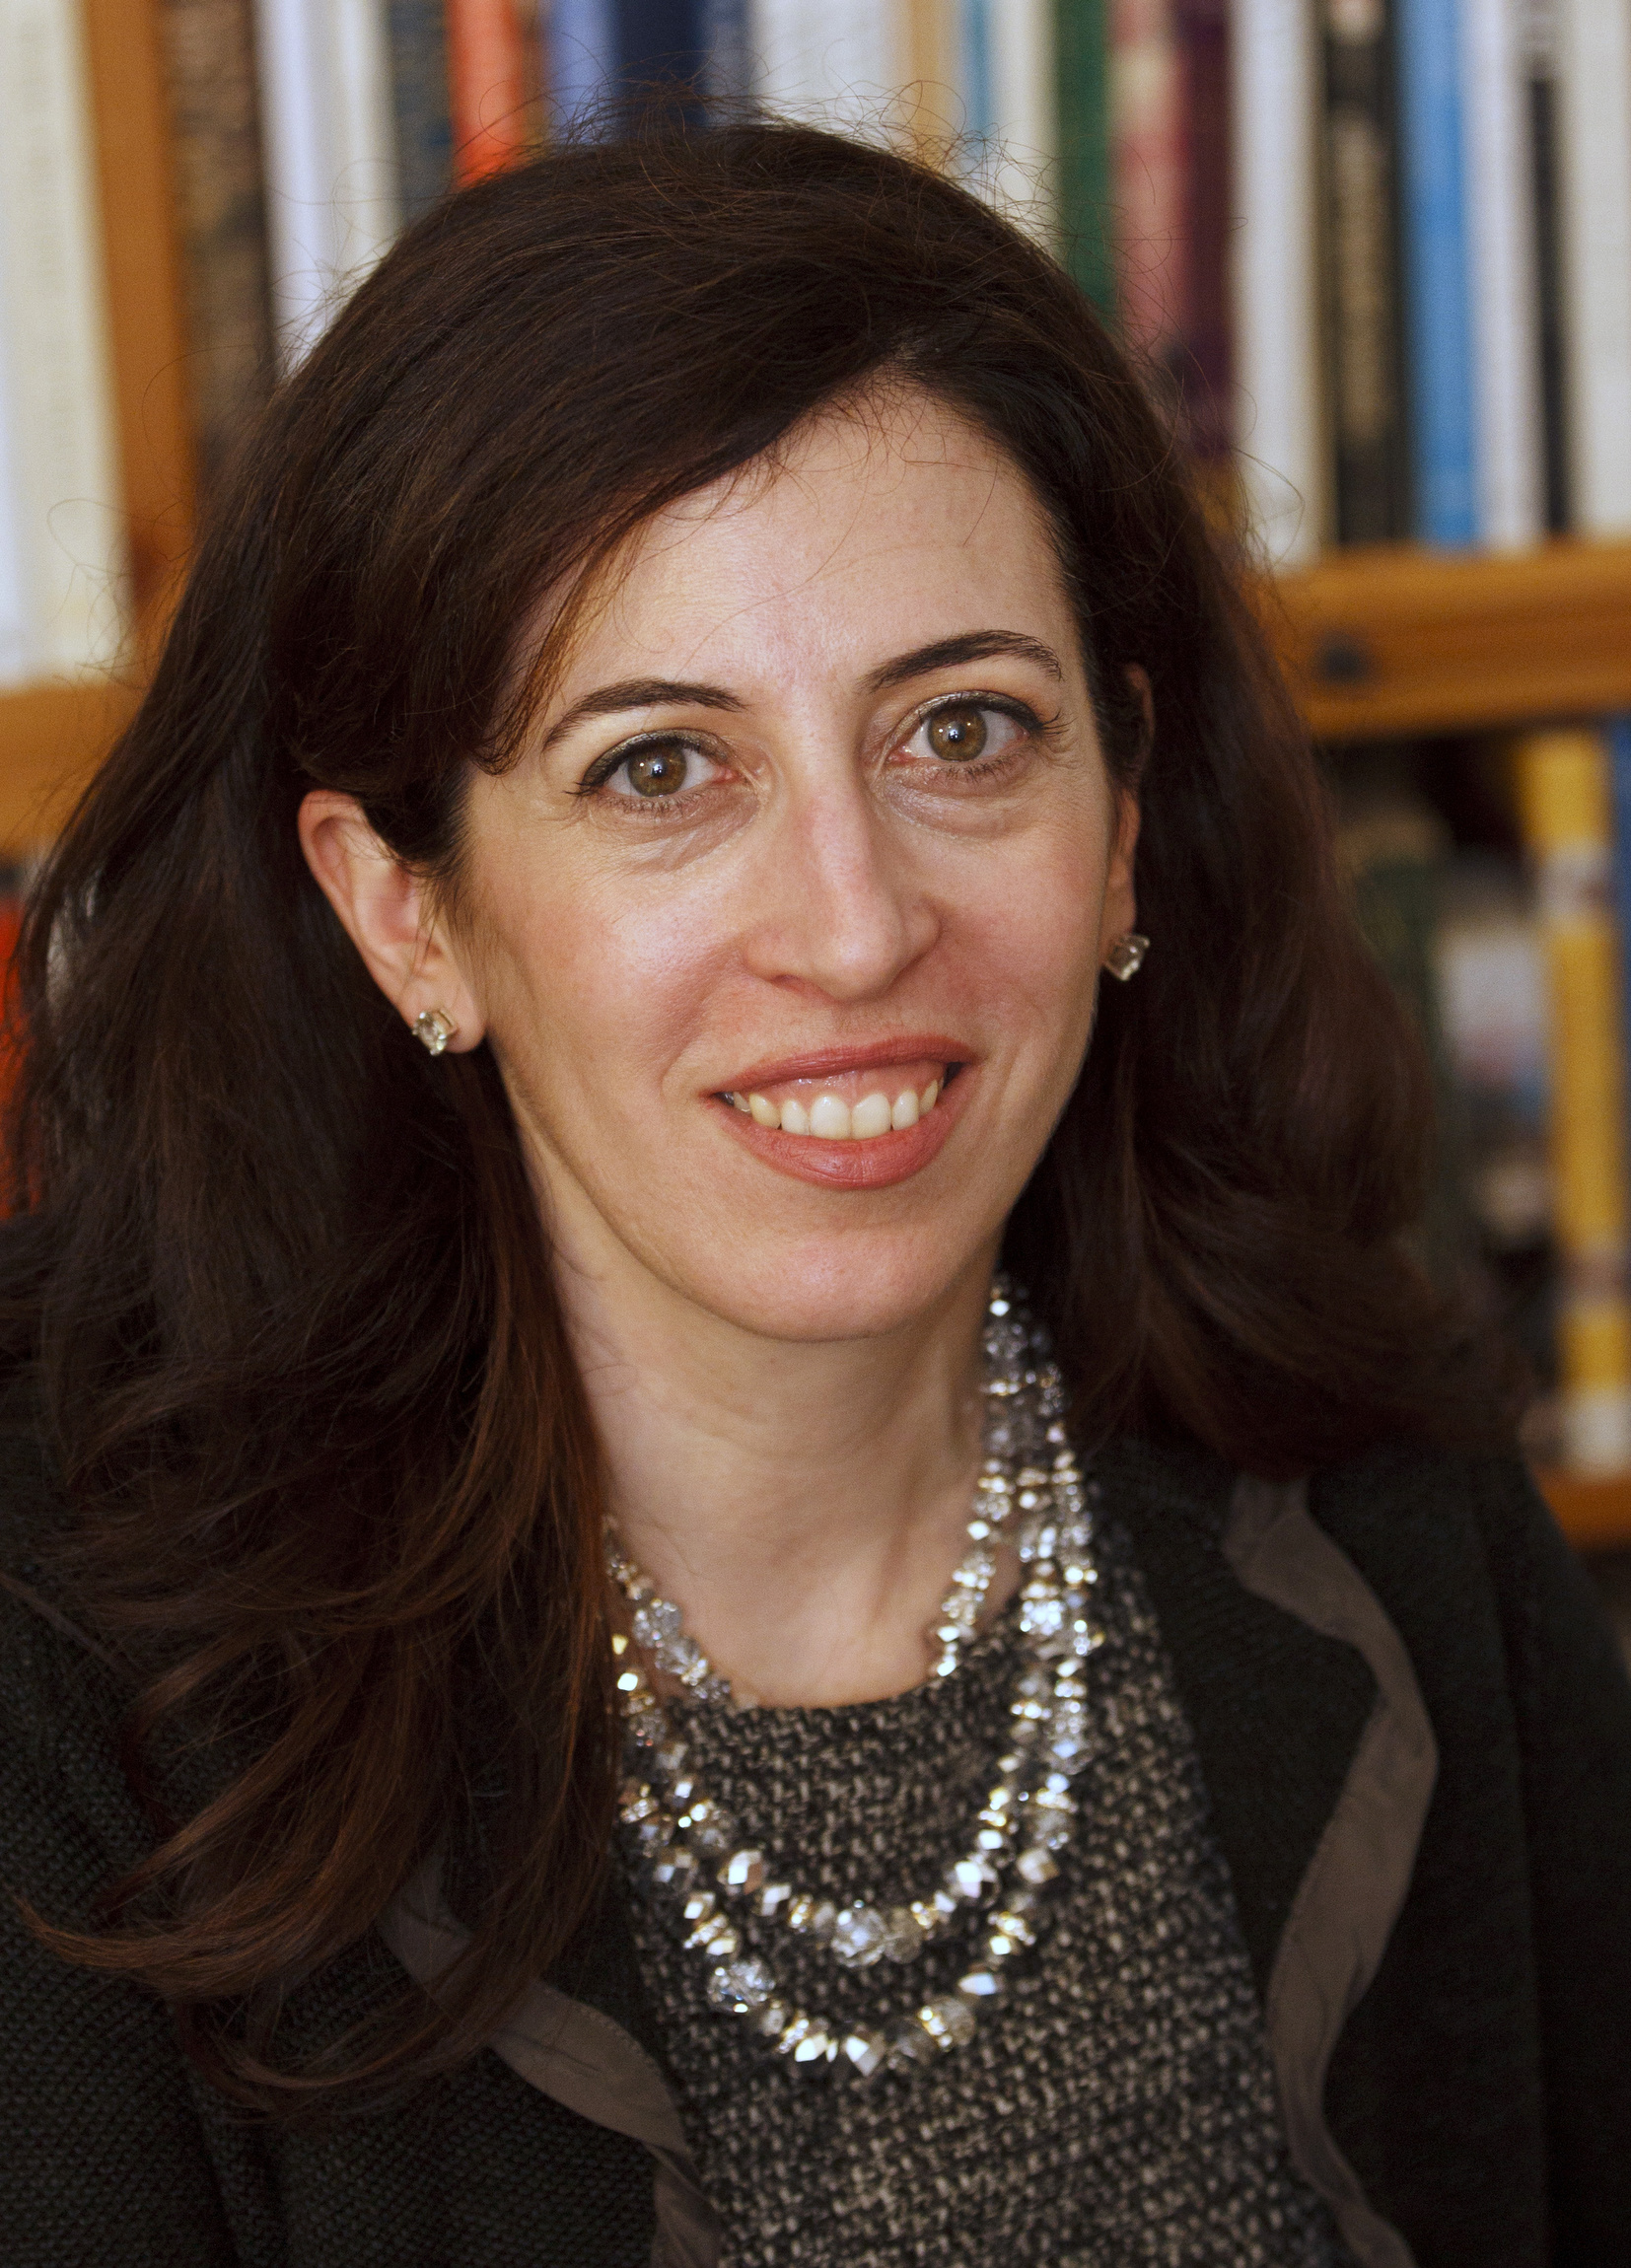 Dr. Pia de Slenni